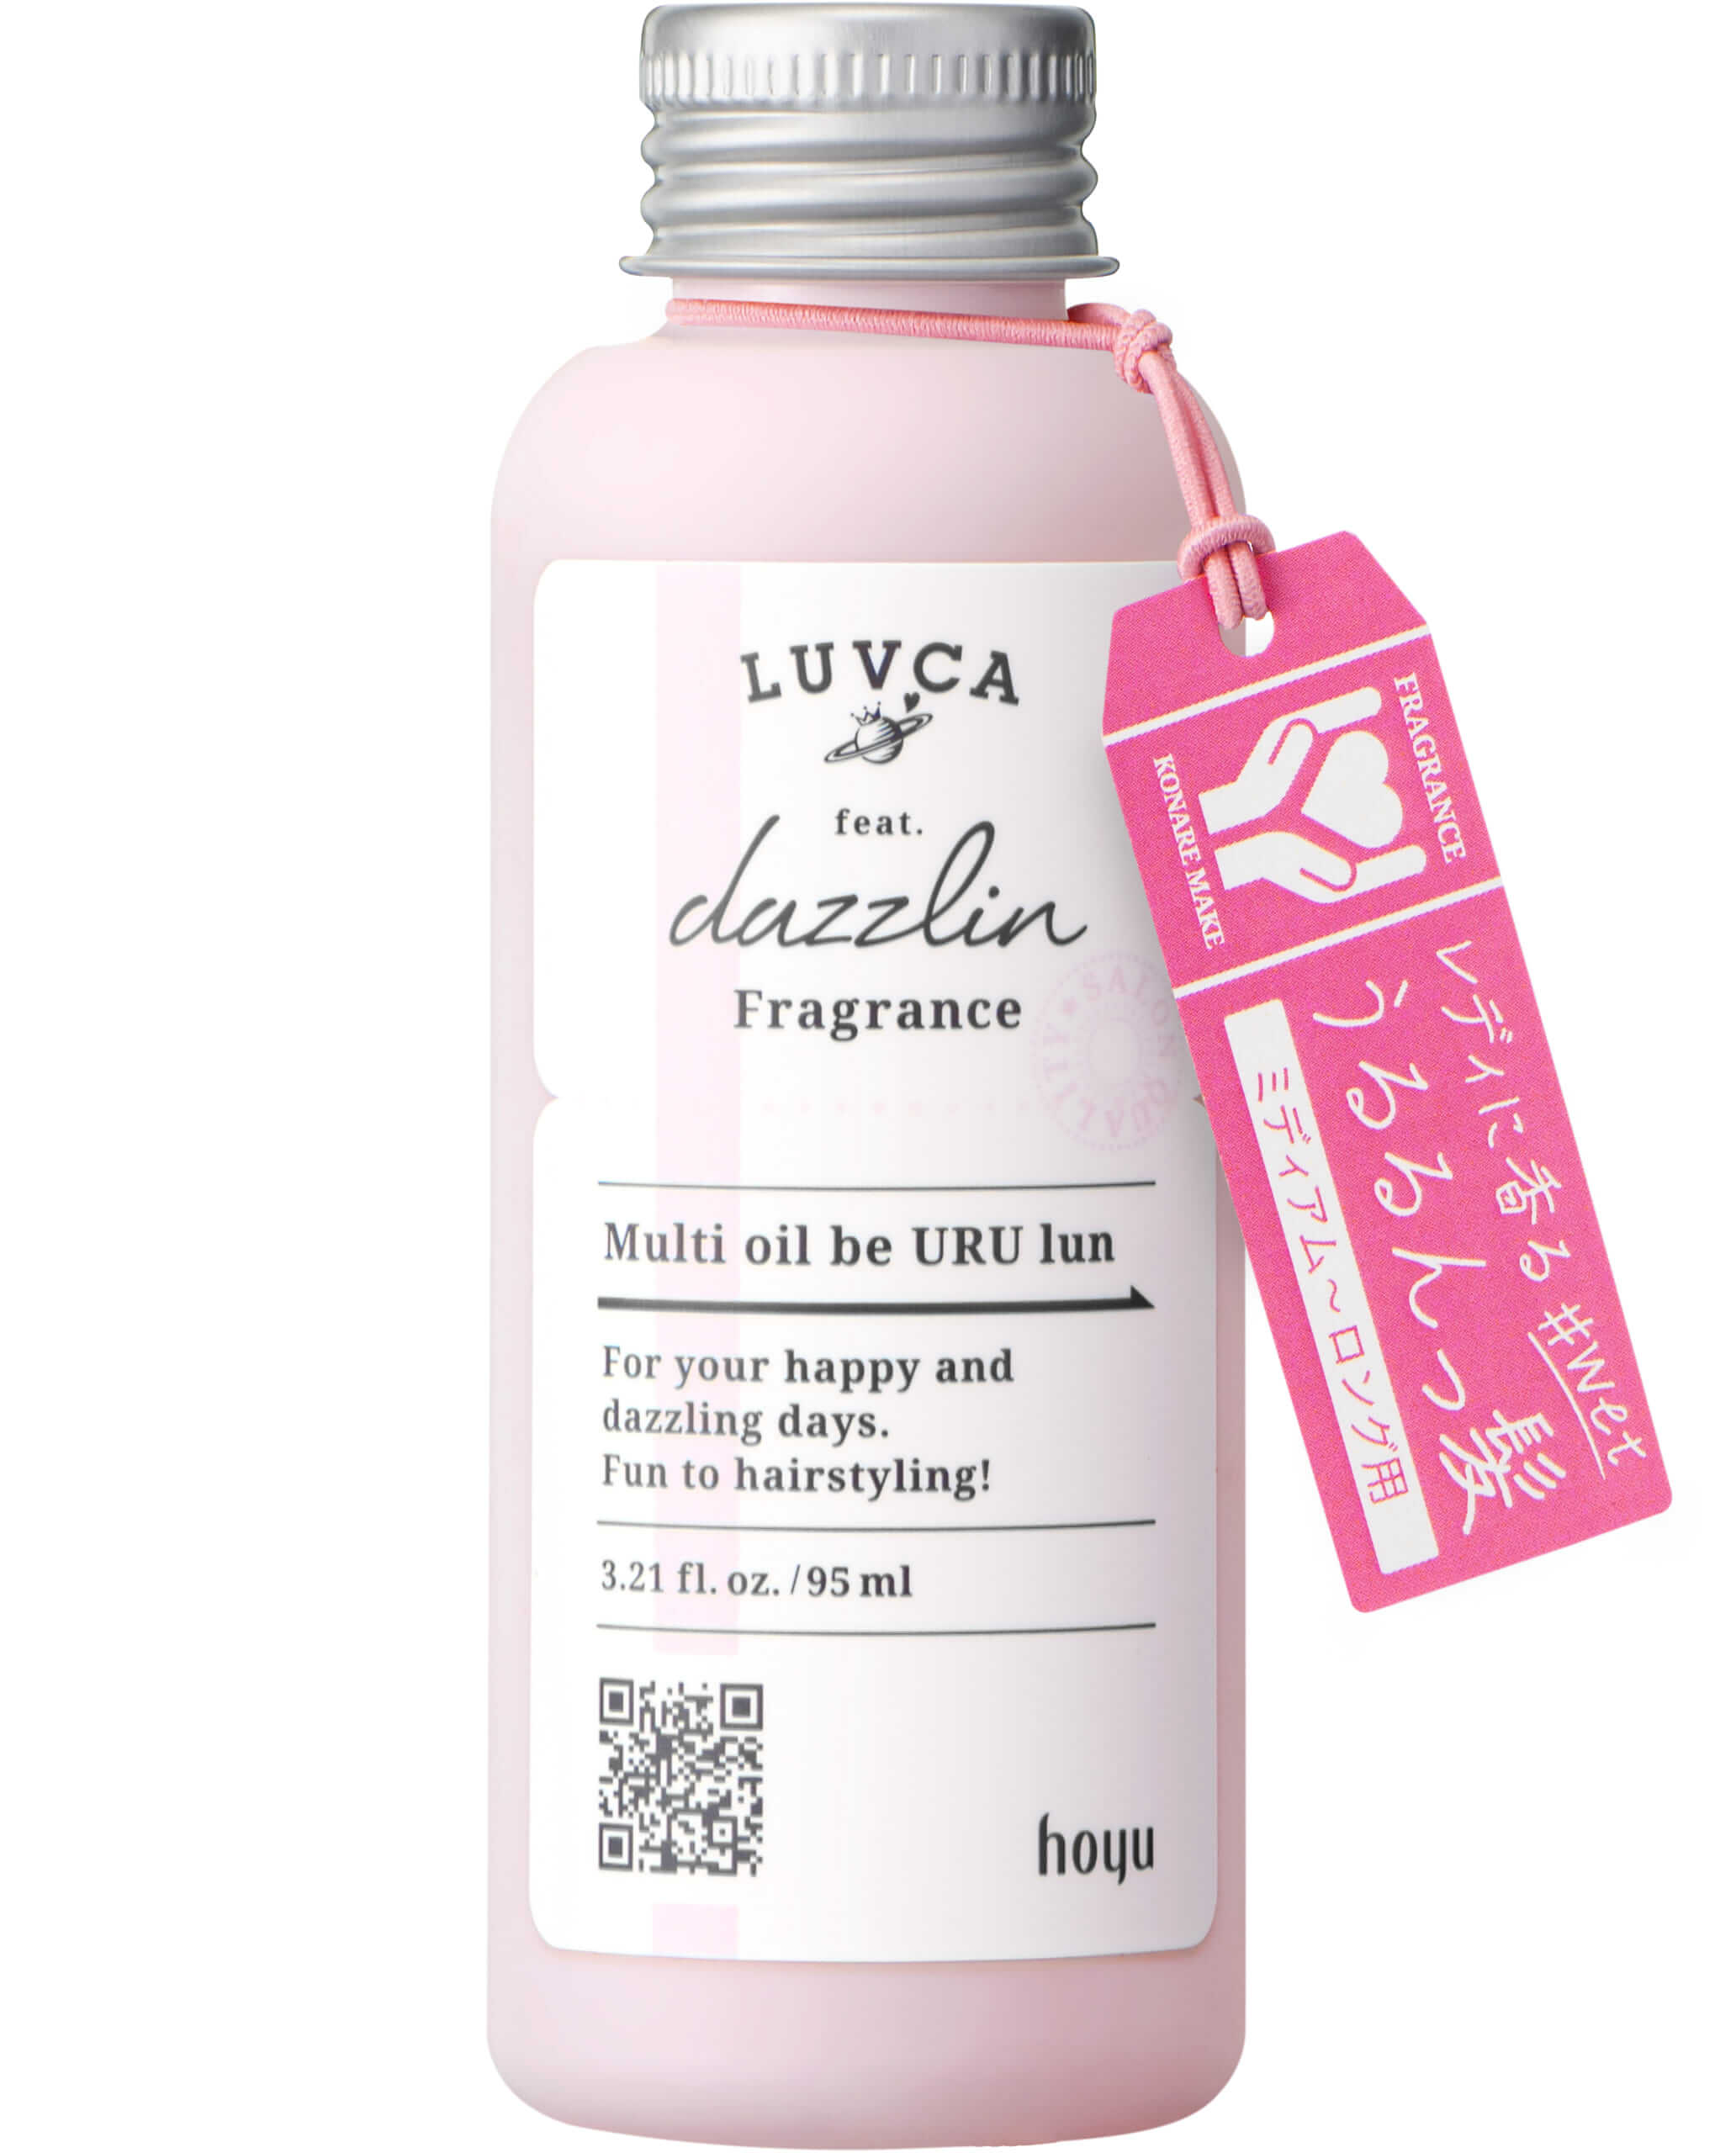 LUVCA×dazzlin フレグランスオイルのURU lun 95ml/¥1,400(税抜き)